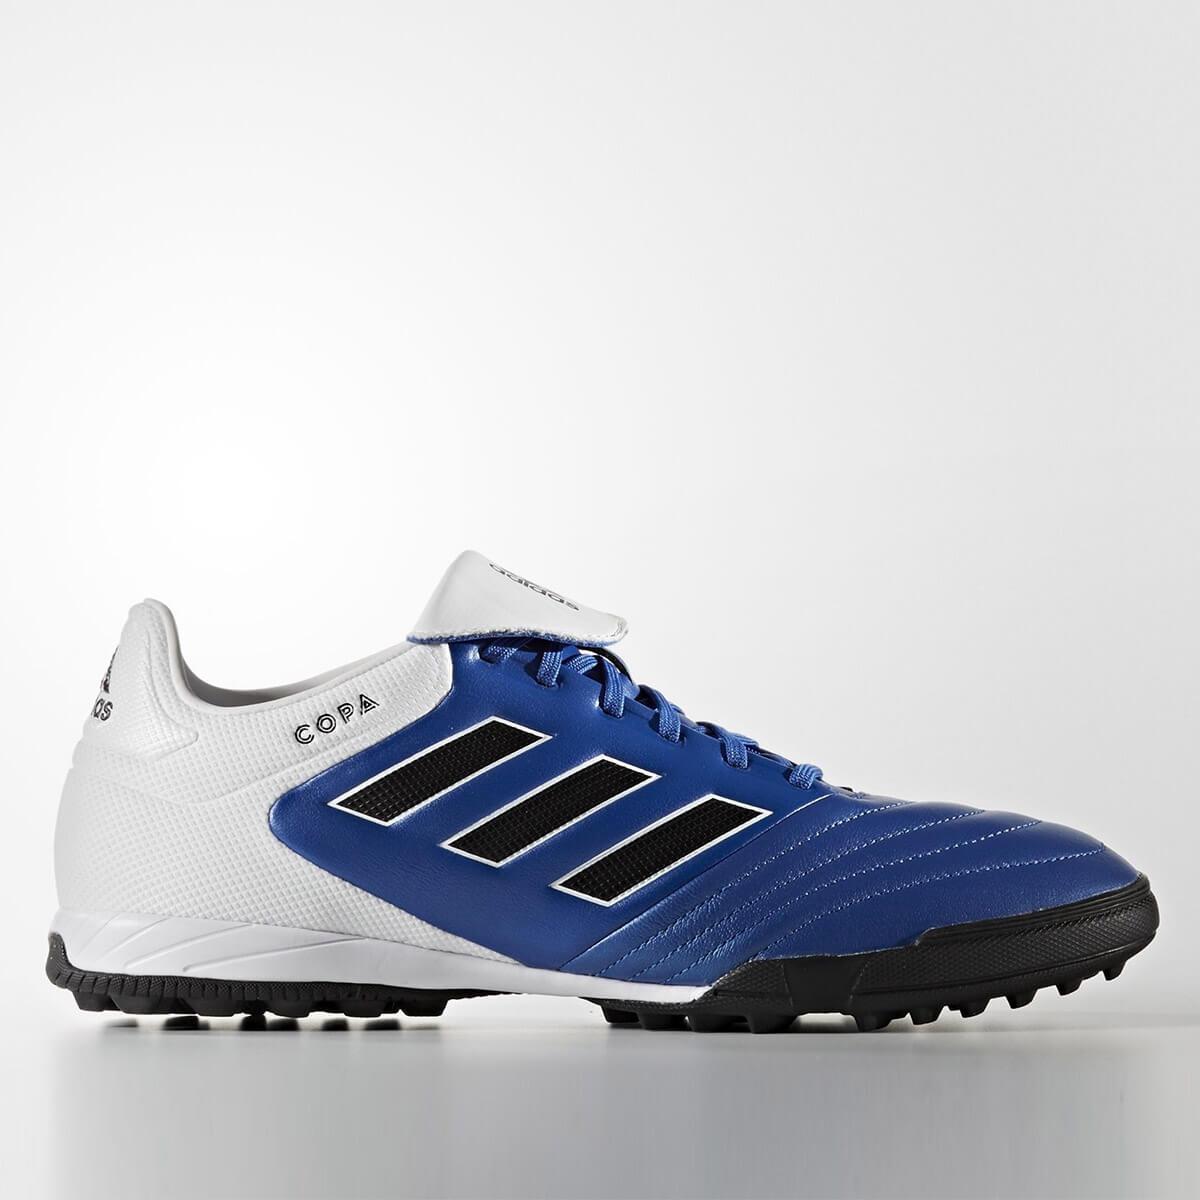 4a2554fe5e19b Chuteira Society Adidas Copa 17 Tf - BRACIA SHOP  Loja de Roupas ...